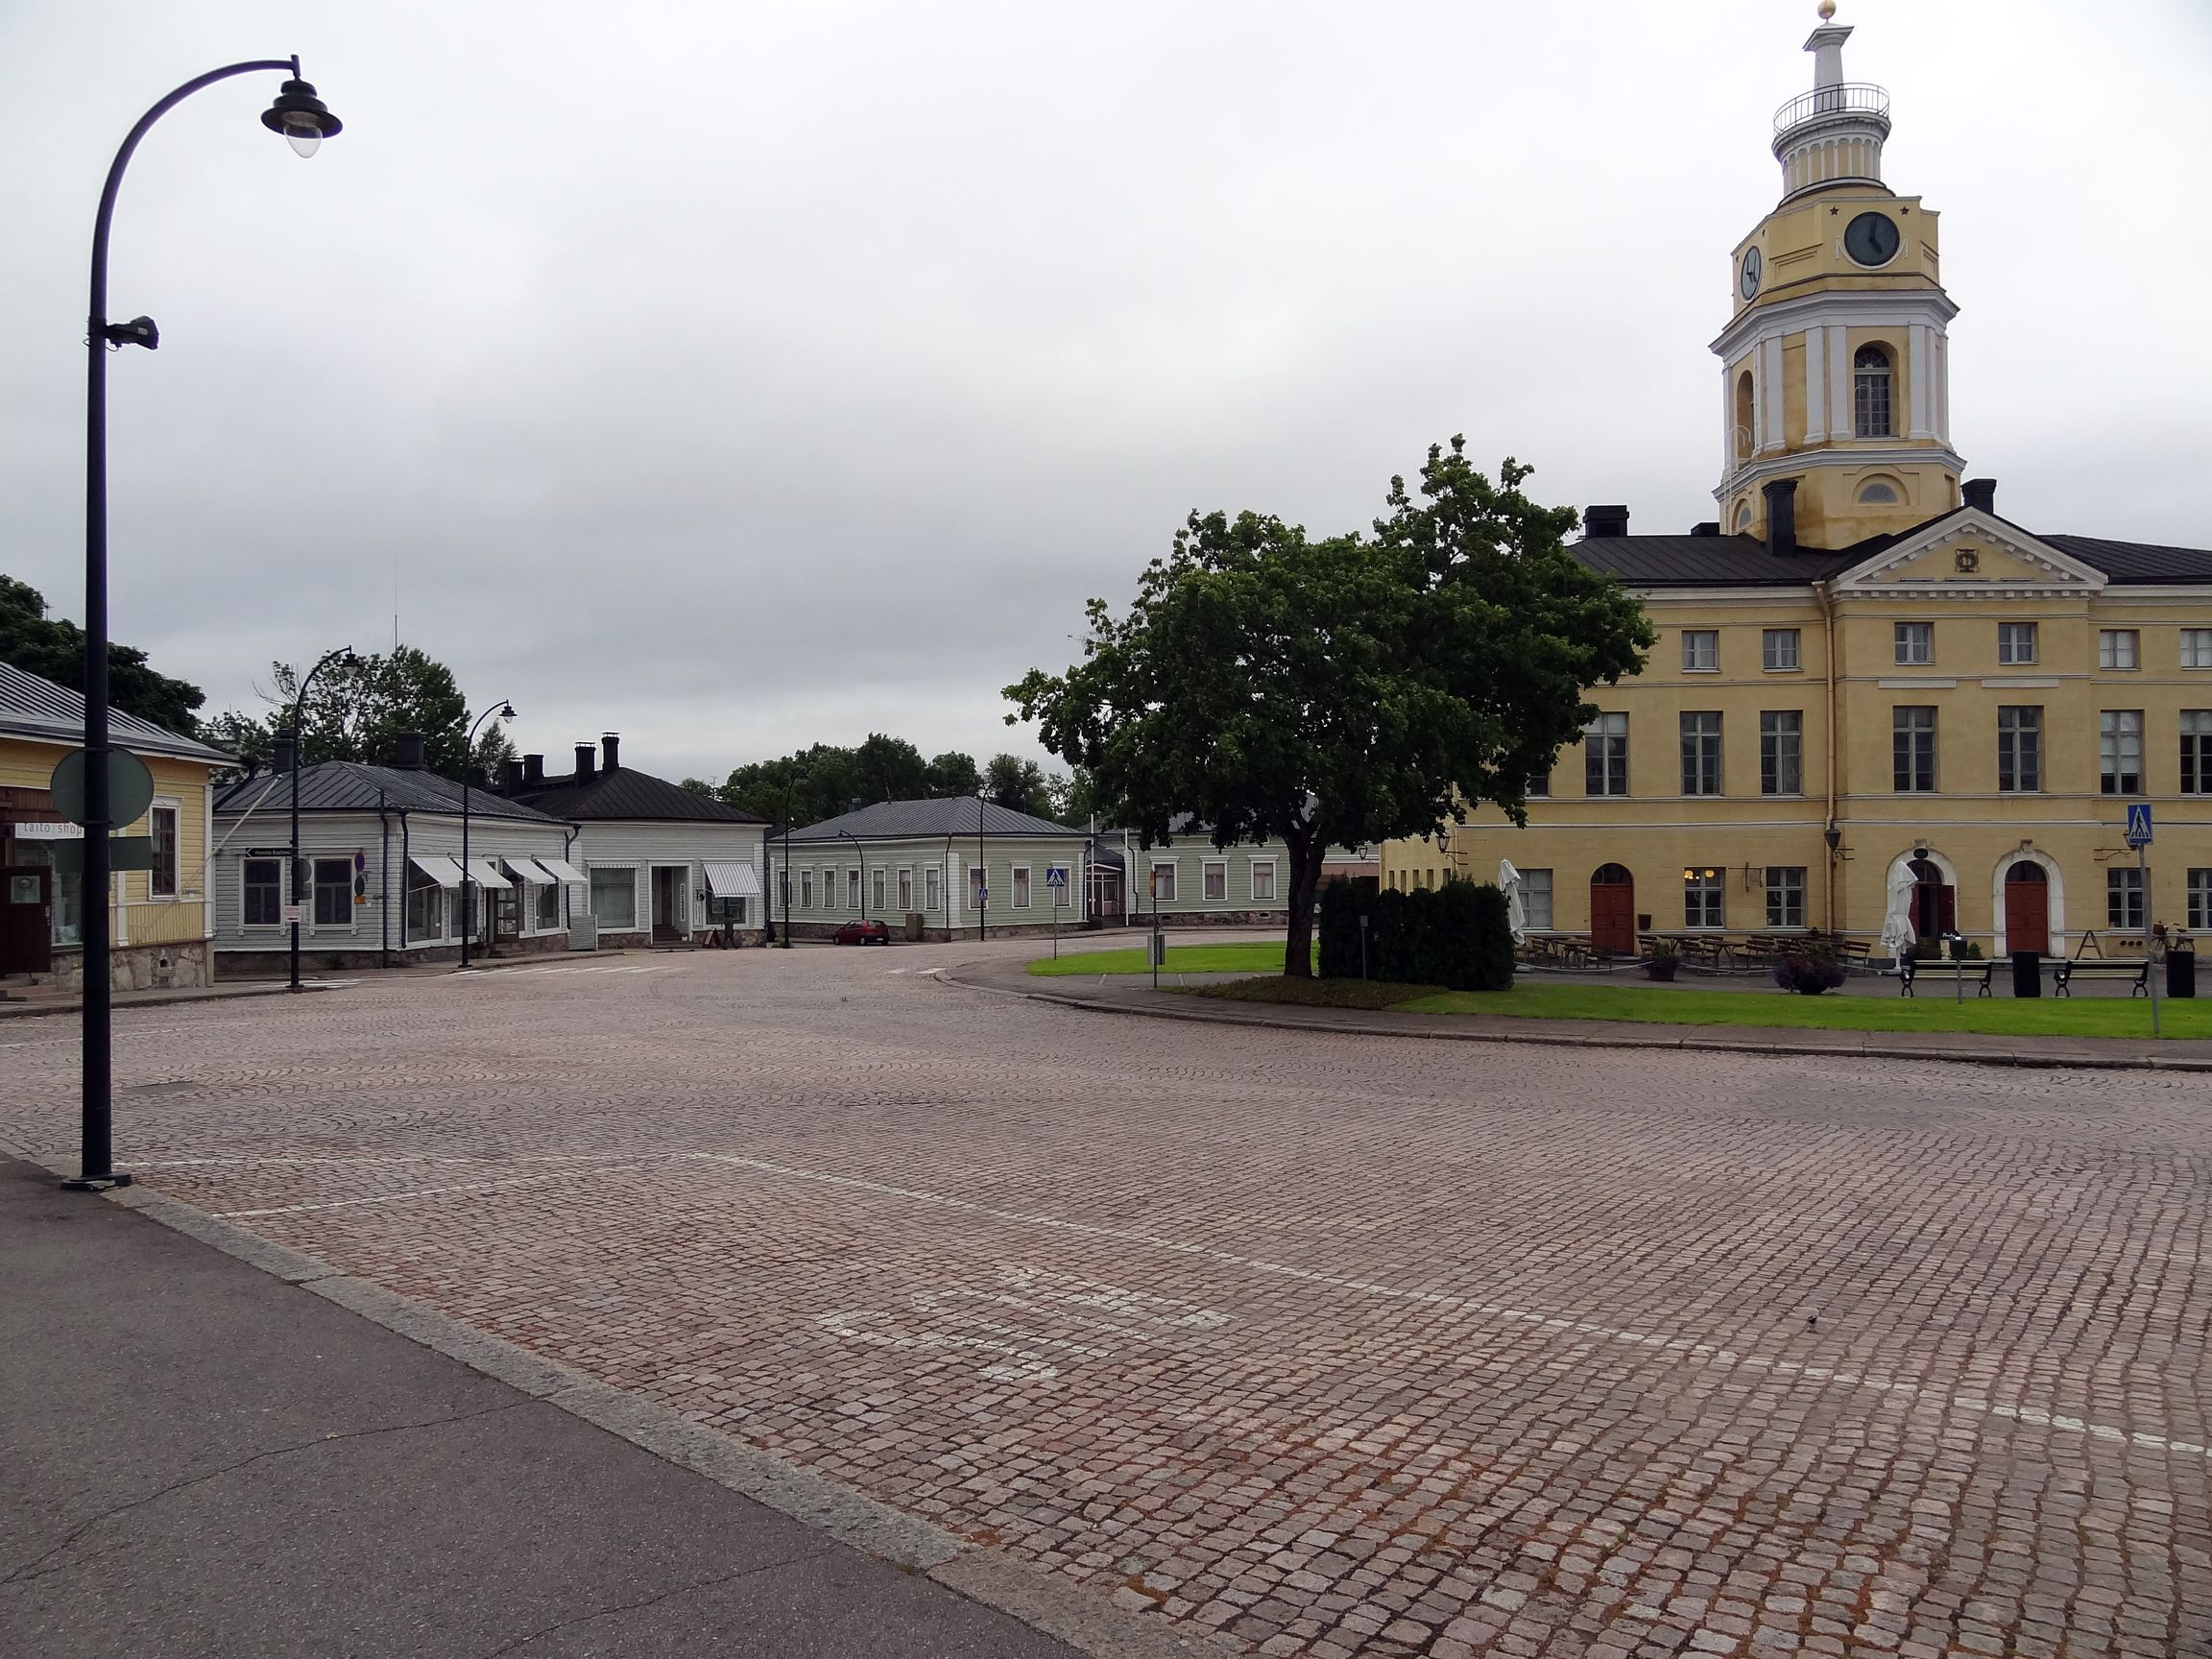 Rathausplatz in Hamina